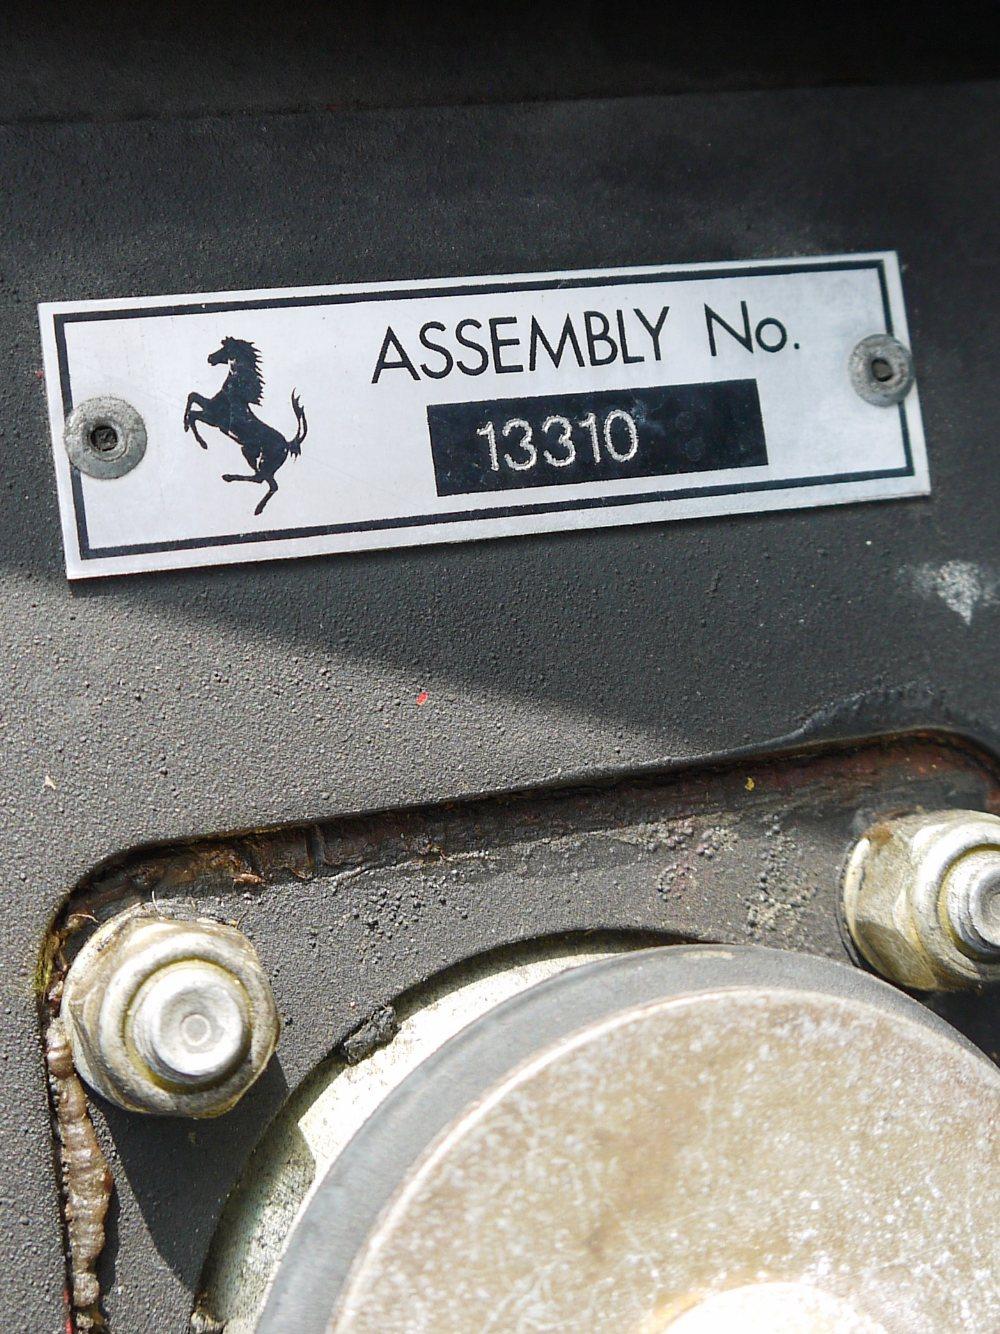 1993 FERRARI 348 TRASVERSALE BERLINETTA Registration Number: L796THC Chassis Number: - Image 43 of 49